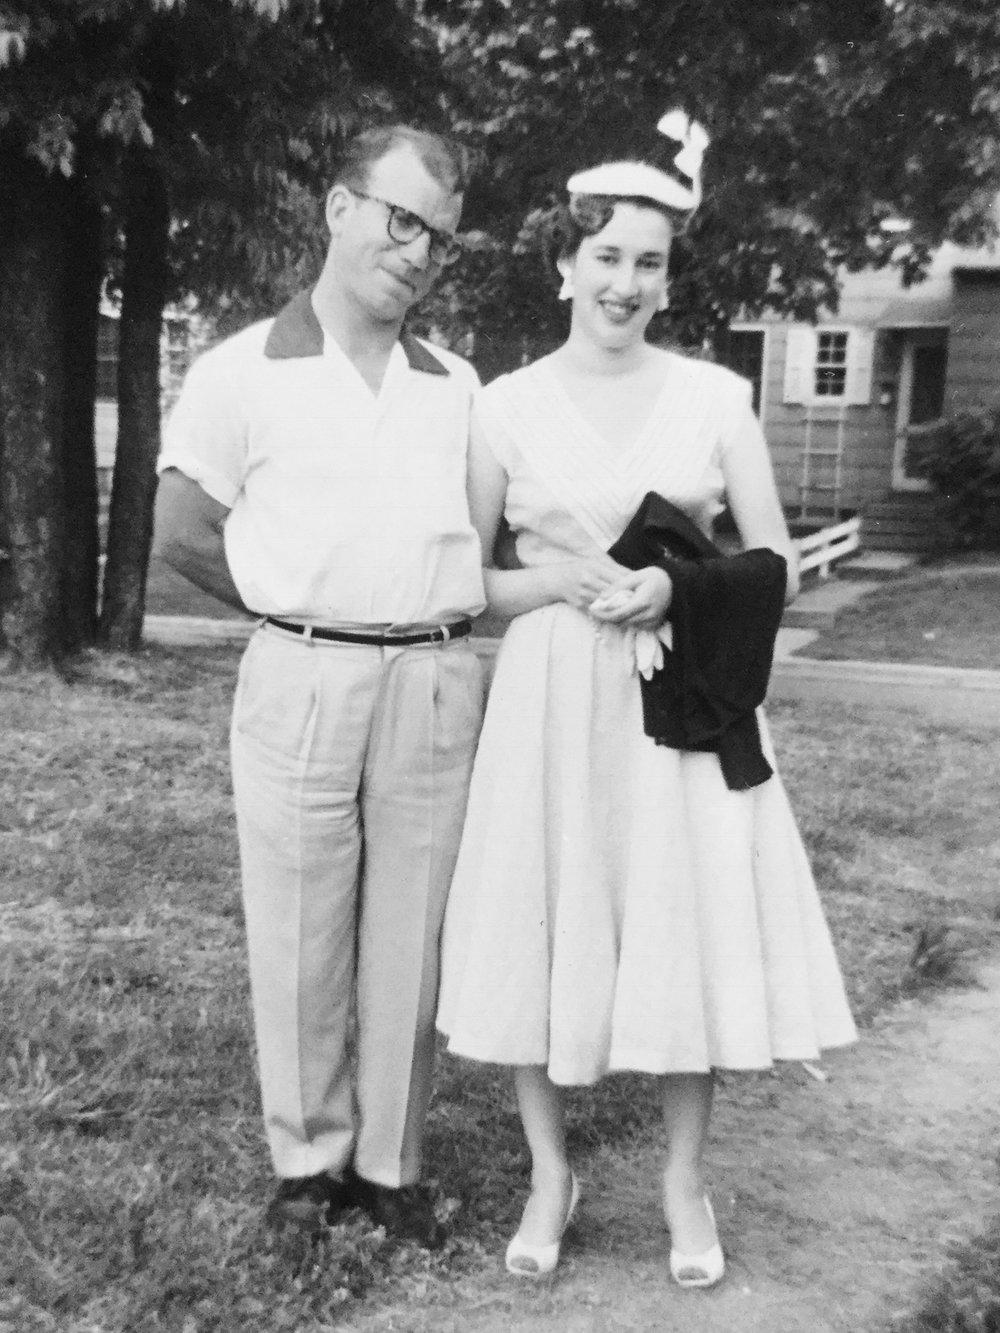 Mom and Dad, Circa 1954